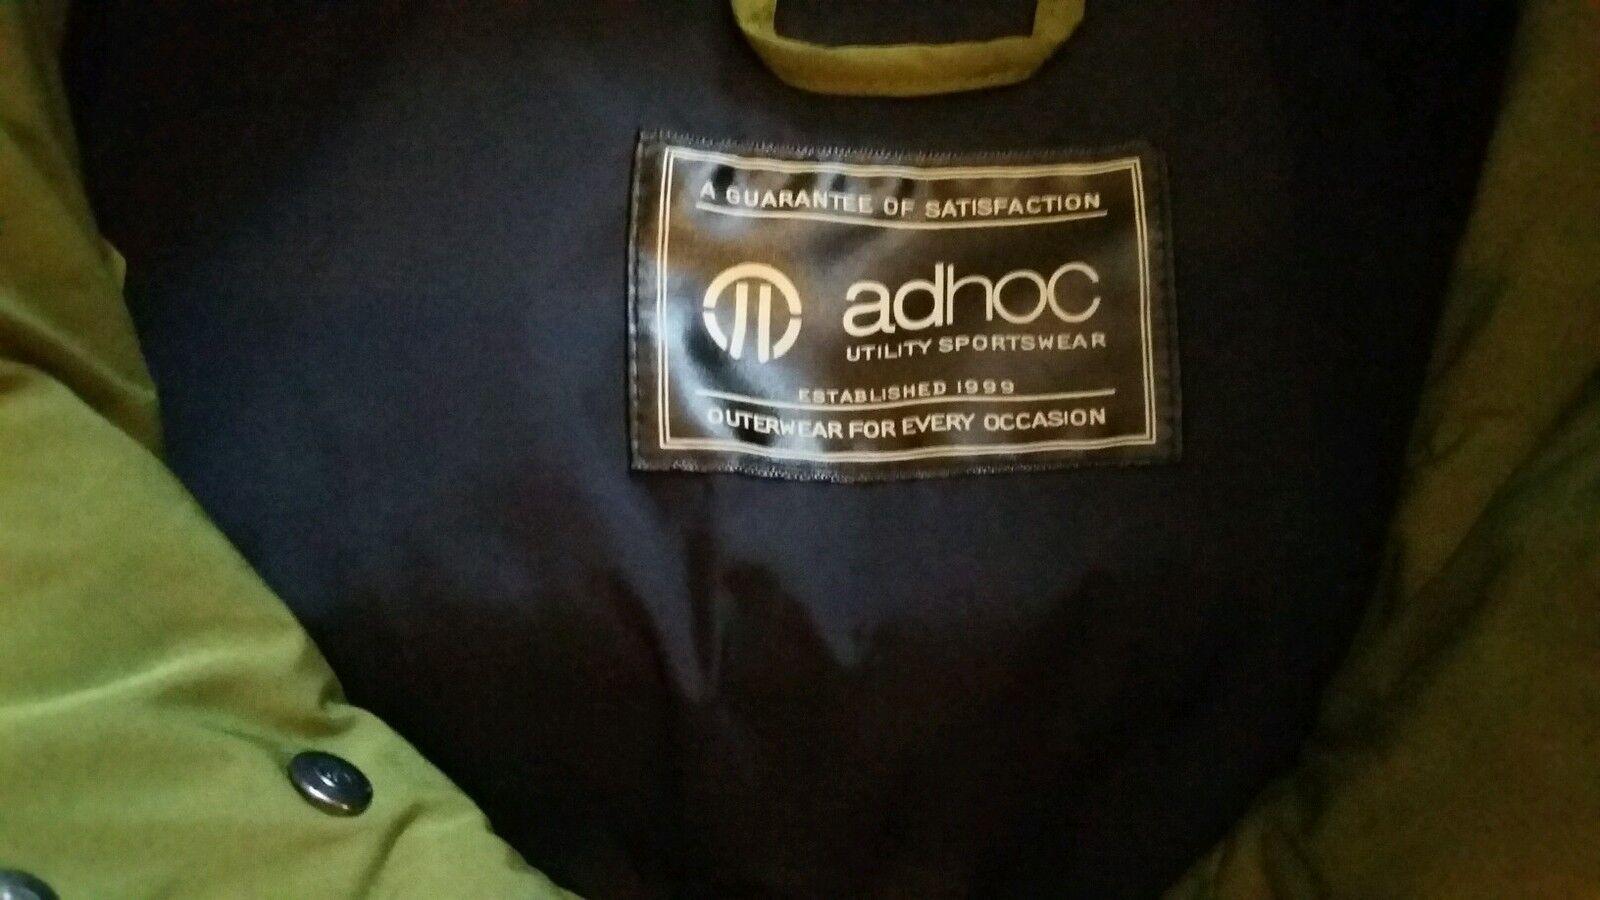 AdHoc utilitaire - Sportswear Veste Vert Taille M RRP - utilitaire £ 175 9ca3f6